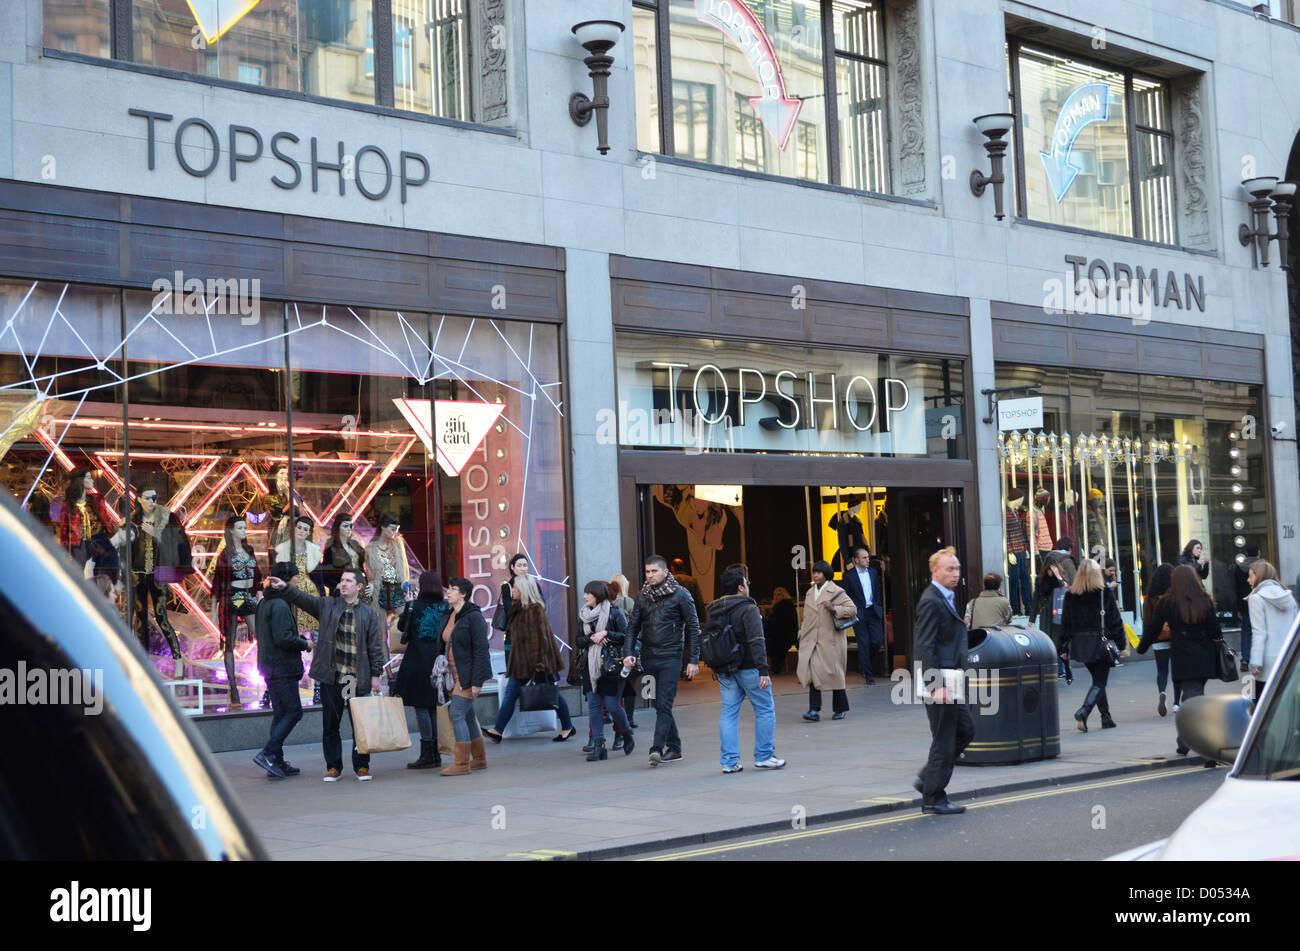 Topshop Oxford street - Stock Image